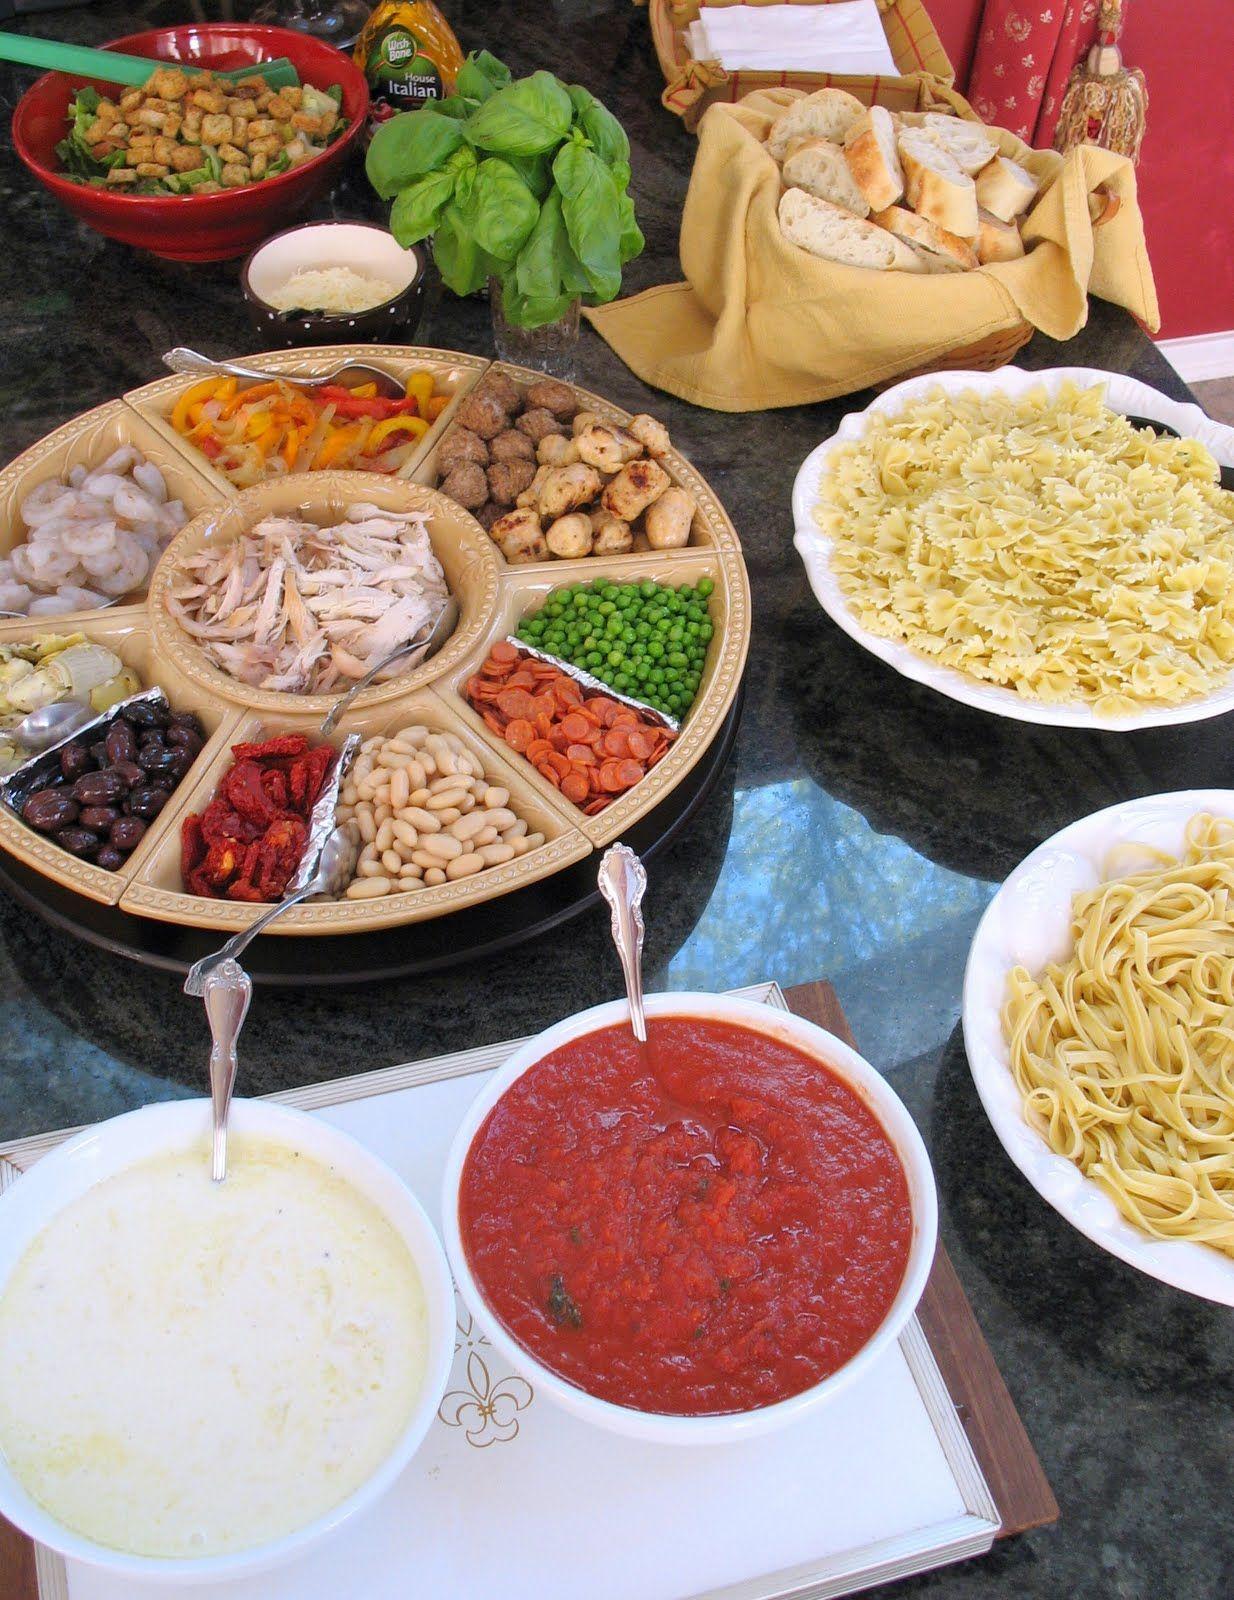 40 amazing family reunion ideas | party food/ ideas | pinterest